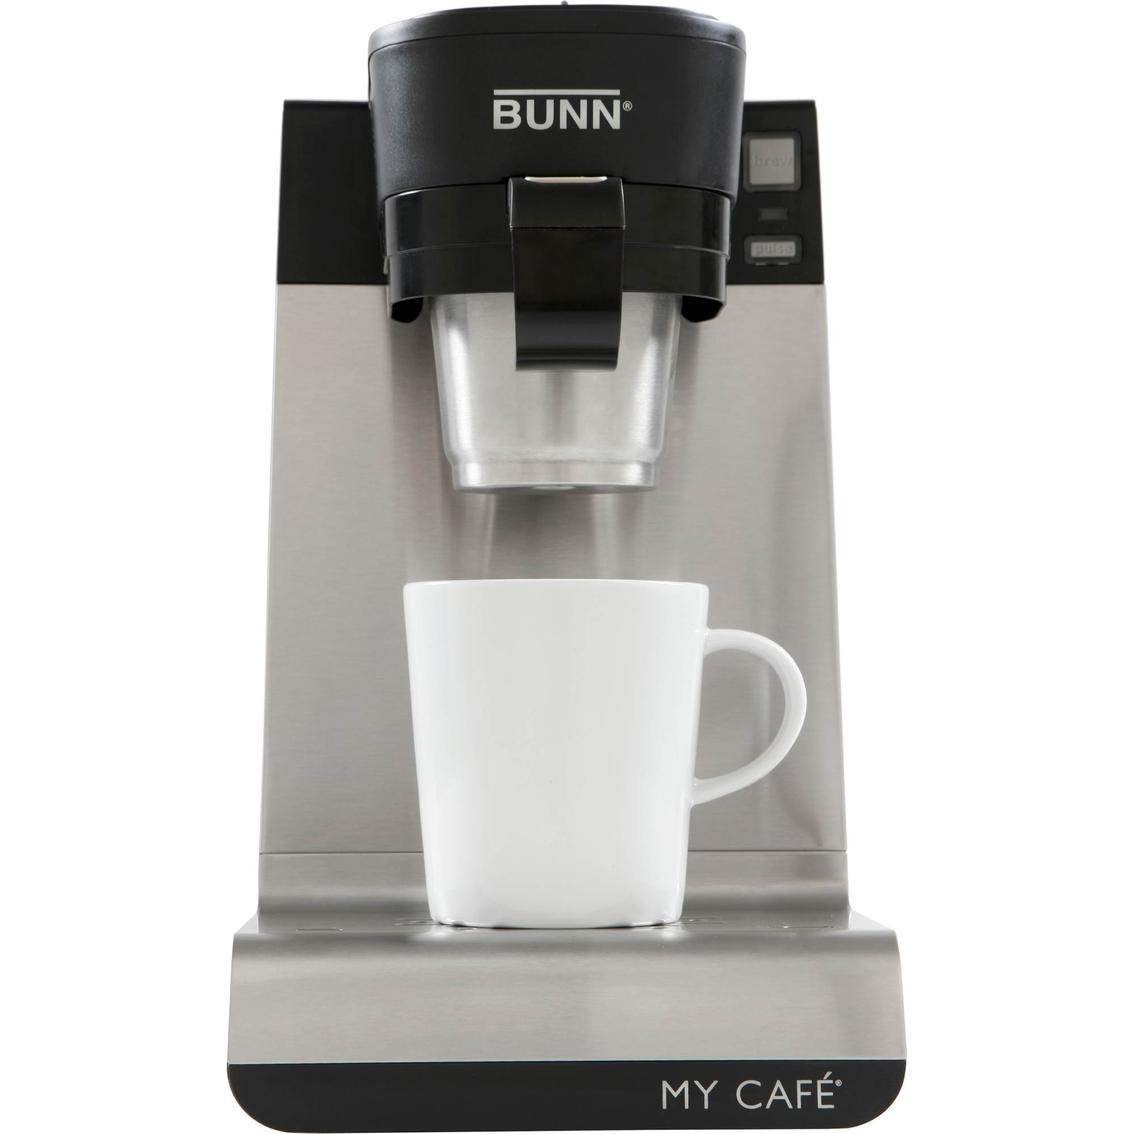 Bunn Coffee Maker Single Serve : Bunn My Cafe Single Serve Coffee Maker Single Cup Brewers Home & Appliances Shop The Exchange